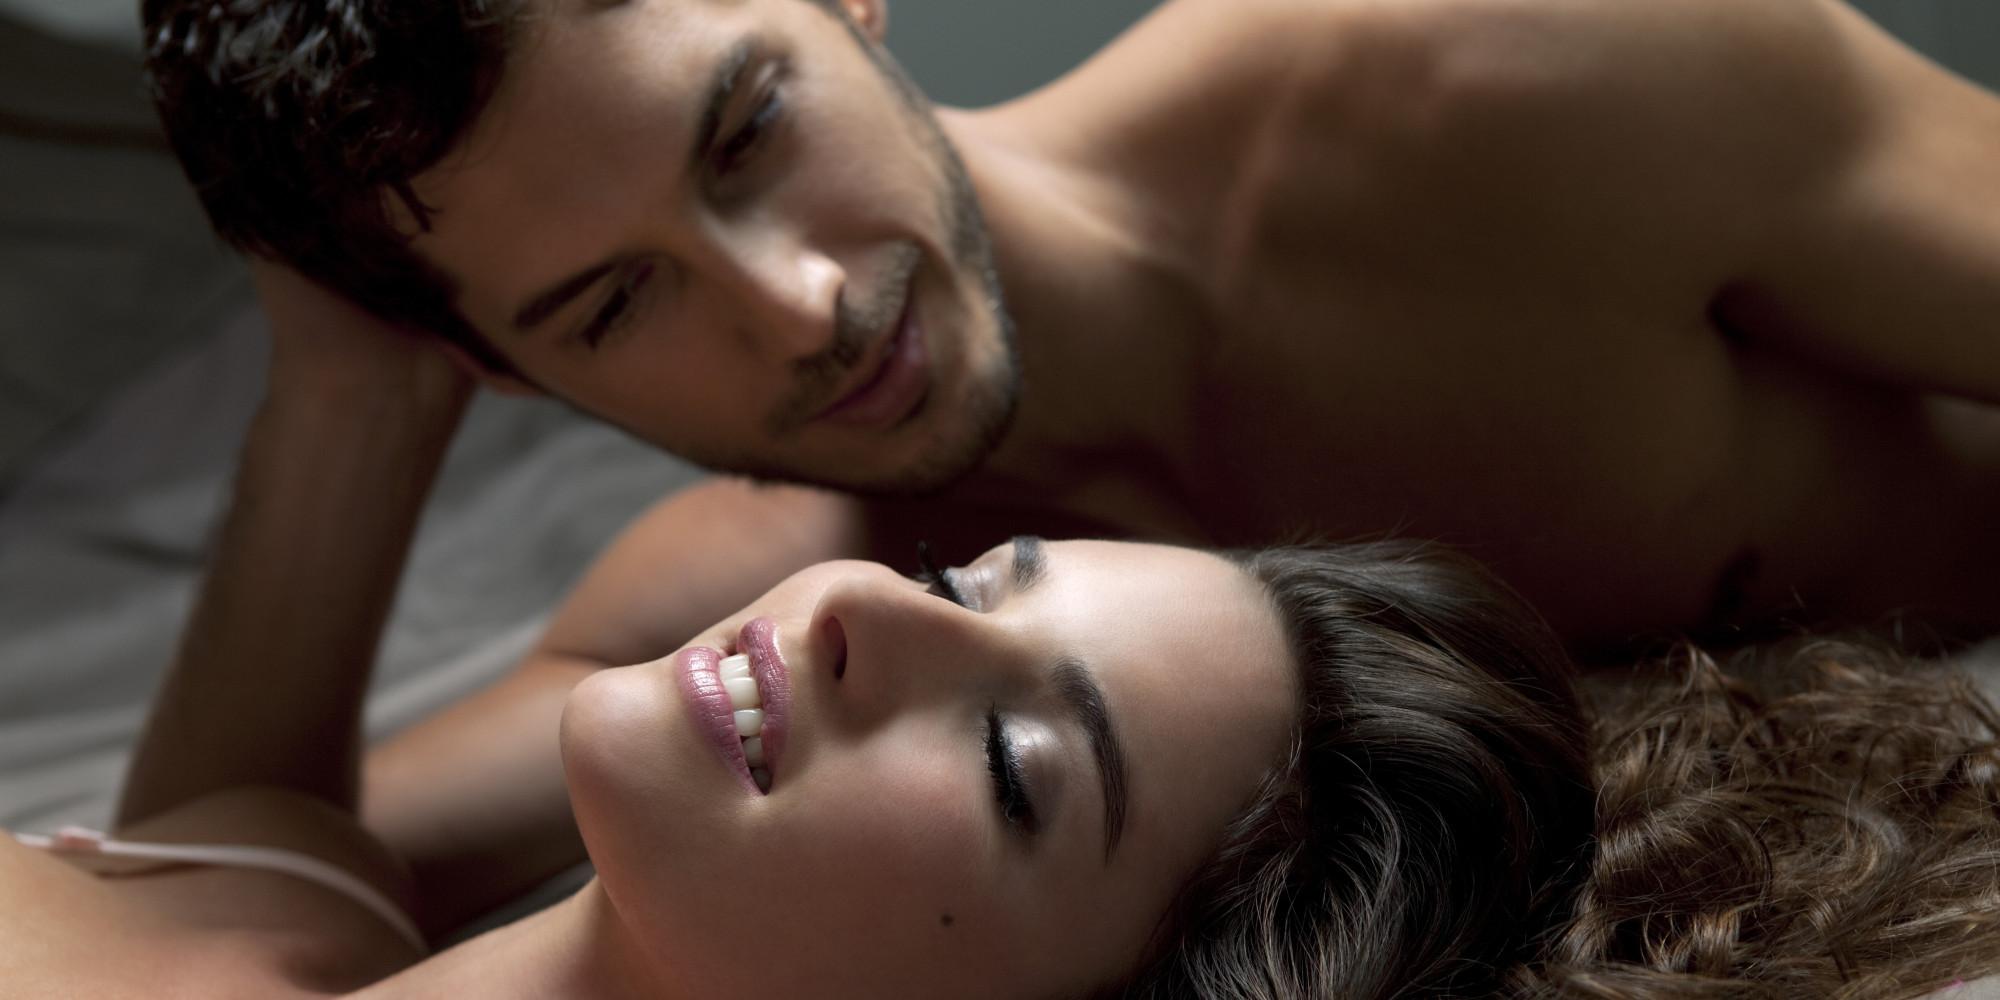 sexo hispano